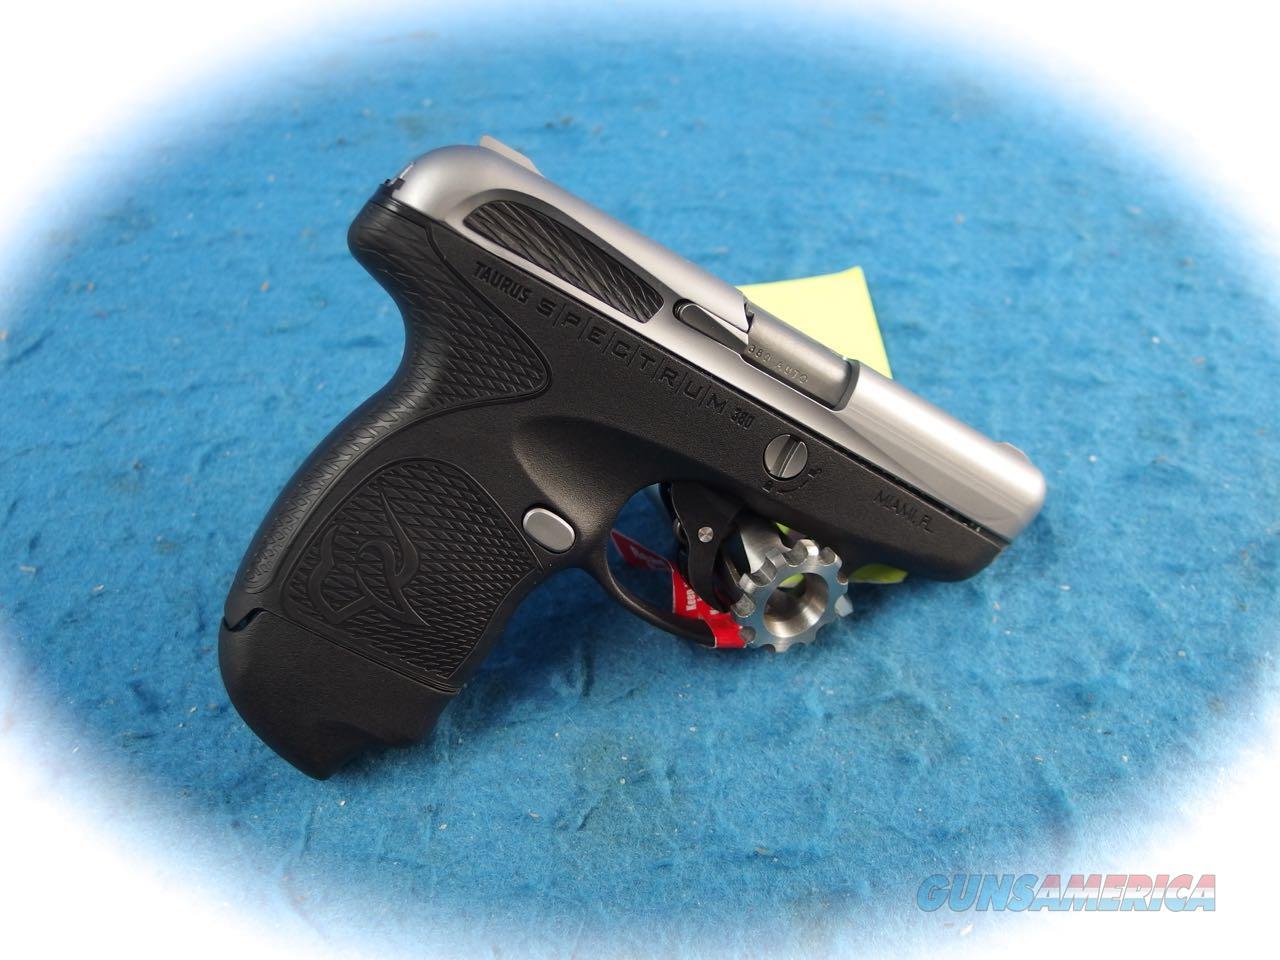 Taurus Spectrum .380 ACP Pistol w/Stainless Slide  **New**  Guns > Pistols > Taurus Pistols > Semi Auto Pistols > Polymer Frame